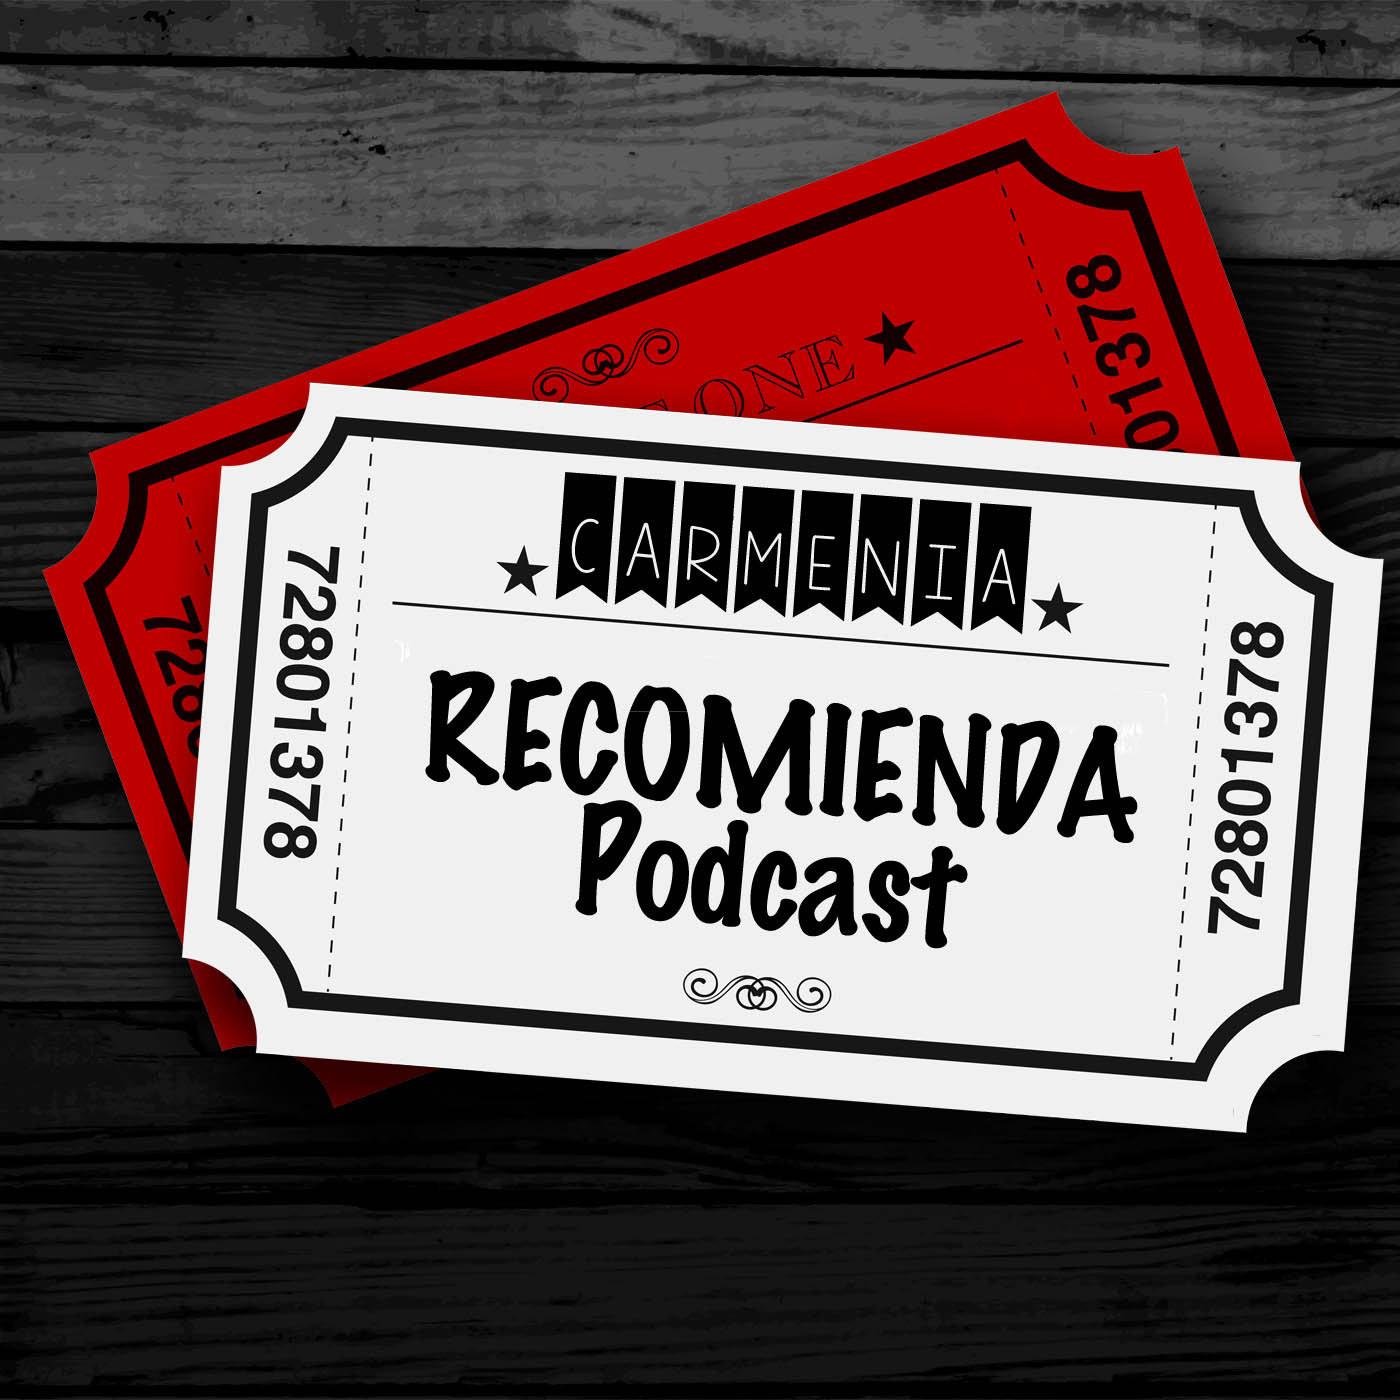 <![CDATA[Podcast Recomienda Podcast]]>